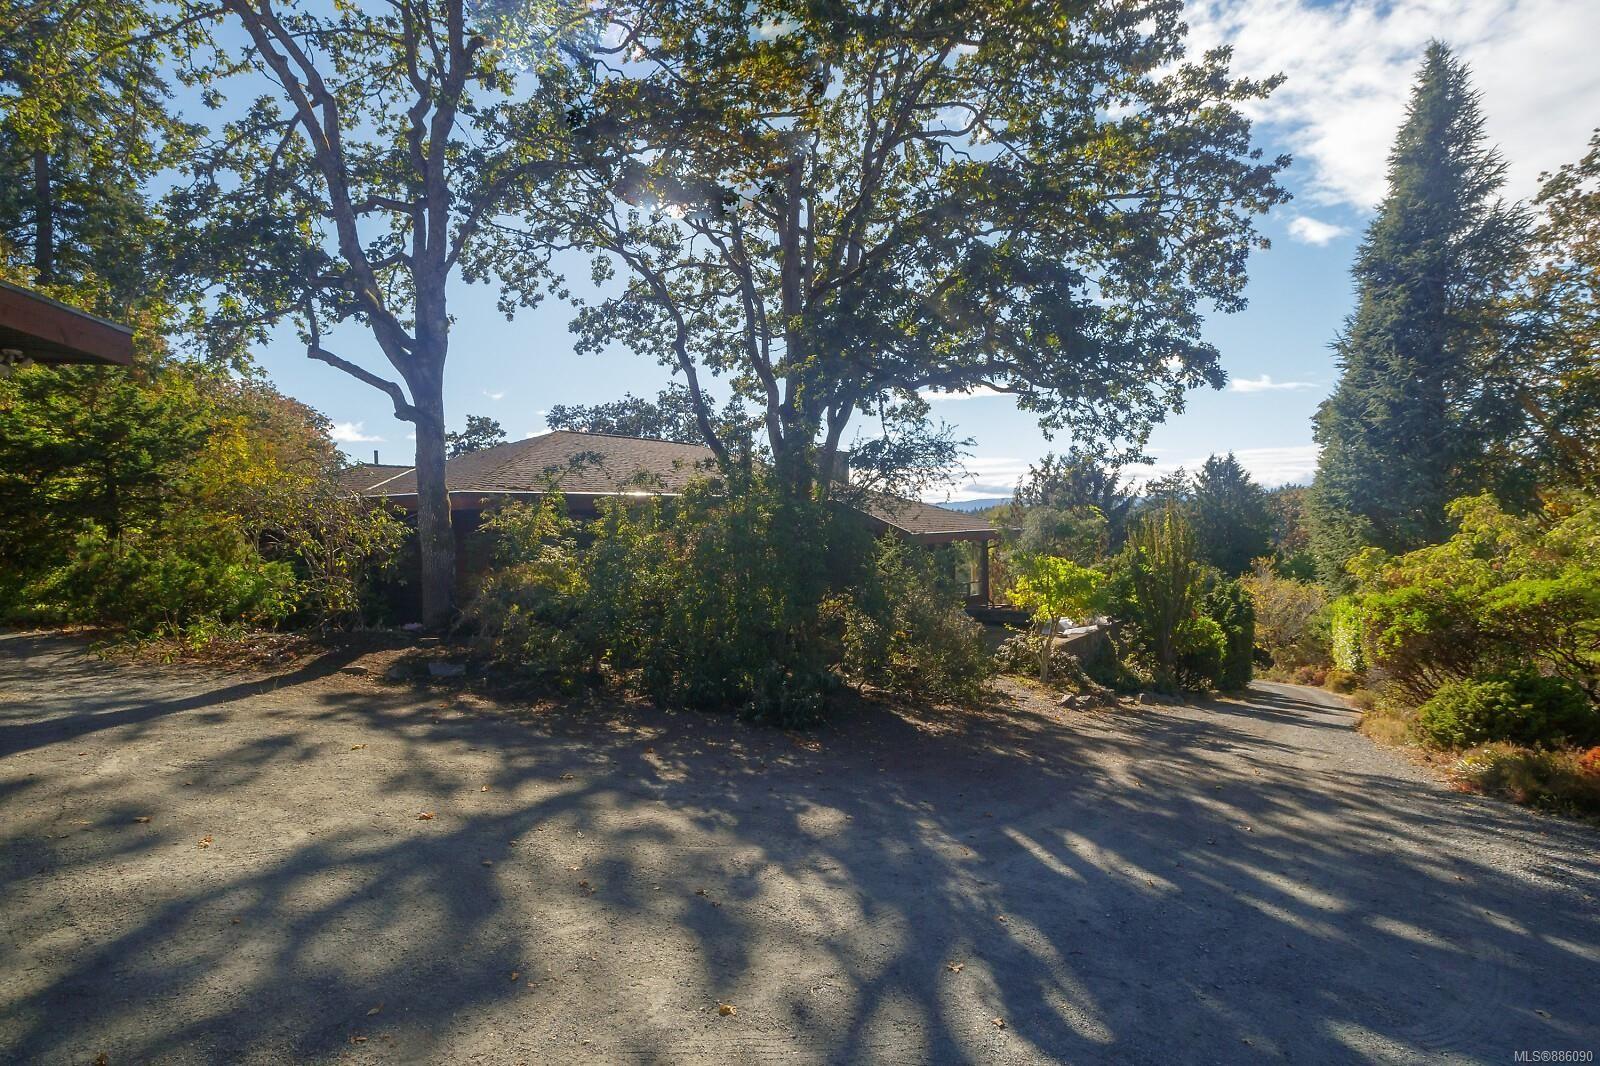 Photo 30: Photos: 4553 Blenkinsop Rd in : SE Blenkinsop House for sale (Saanich East)  : MLS®# 886090